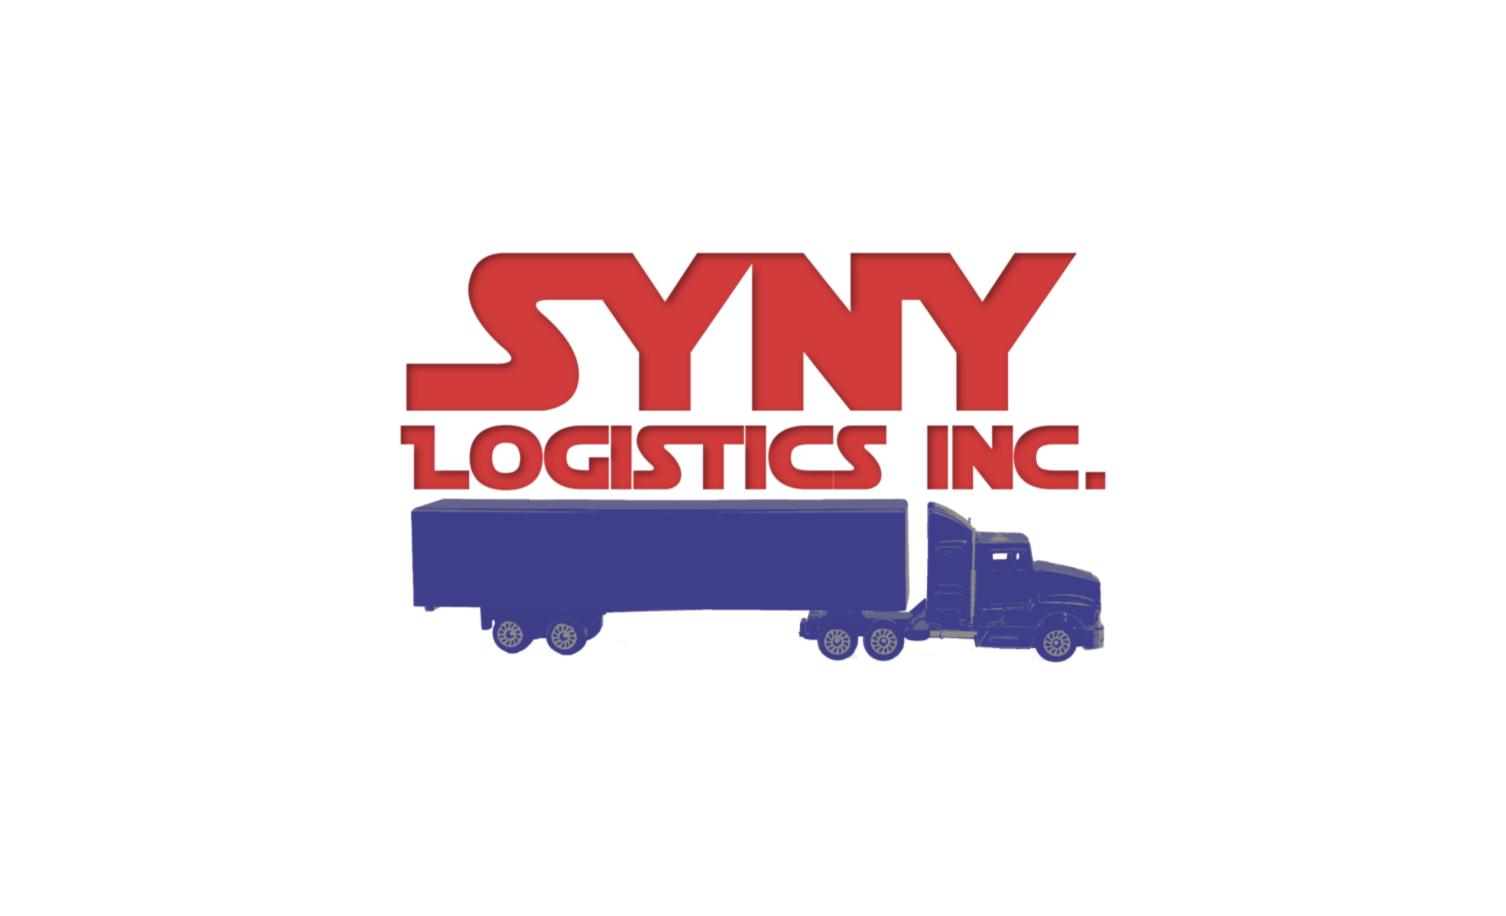 SYNY Logistics Inc.